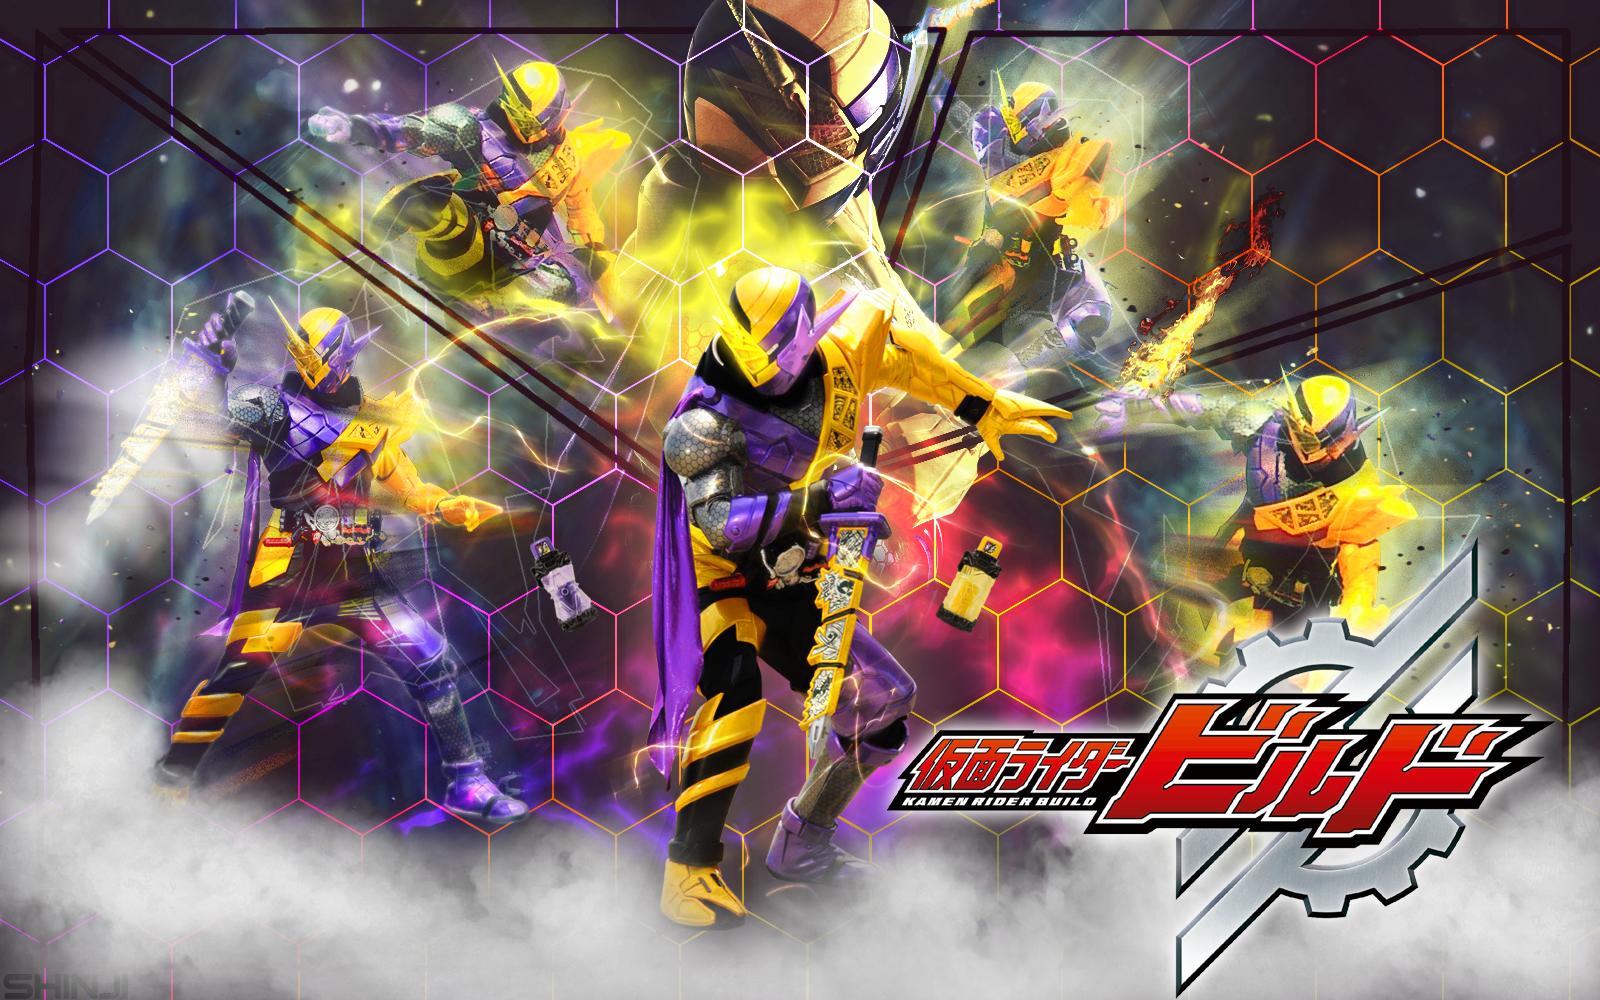 Kamen Rider Build Ninnincomic Form Wallpaper By Malecoc On Deviantart